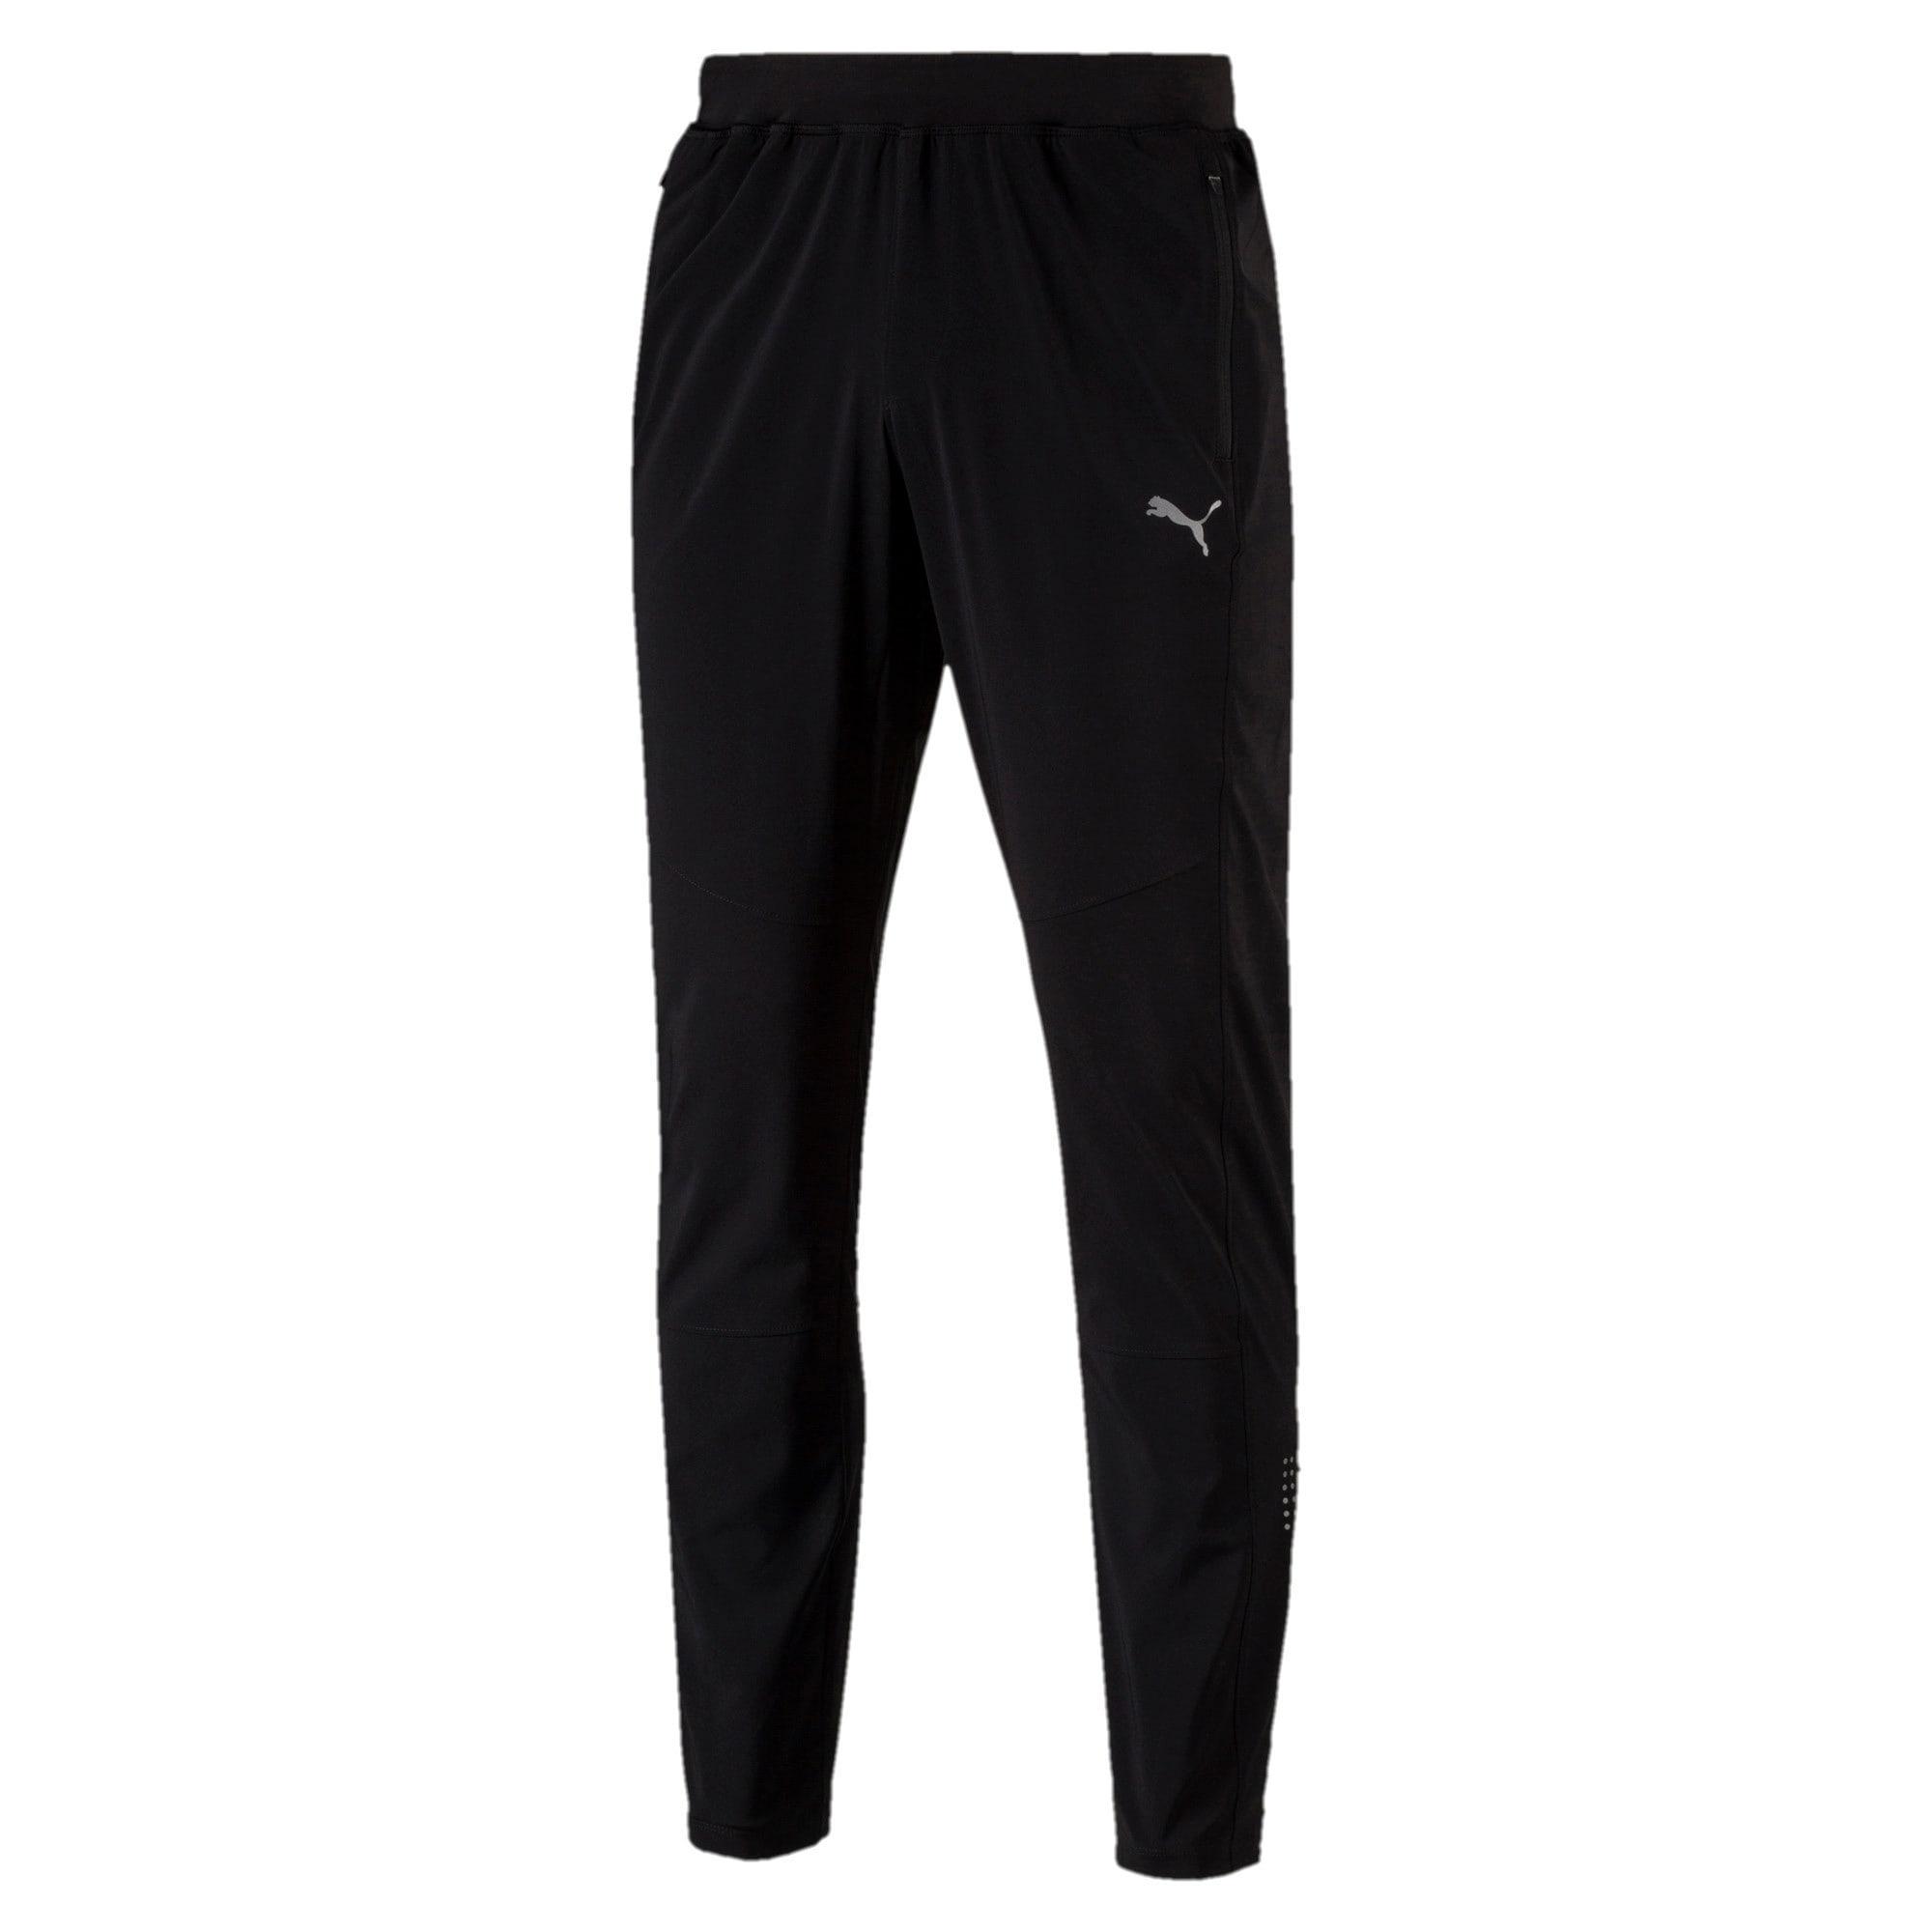 Thumbnail 4 of Tapered Woven Men's Running Pants, Puma Black, medium-IND